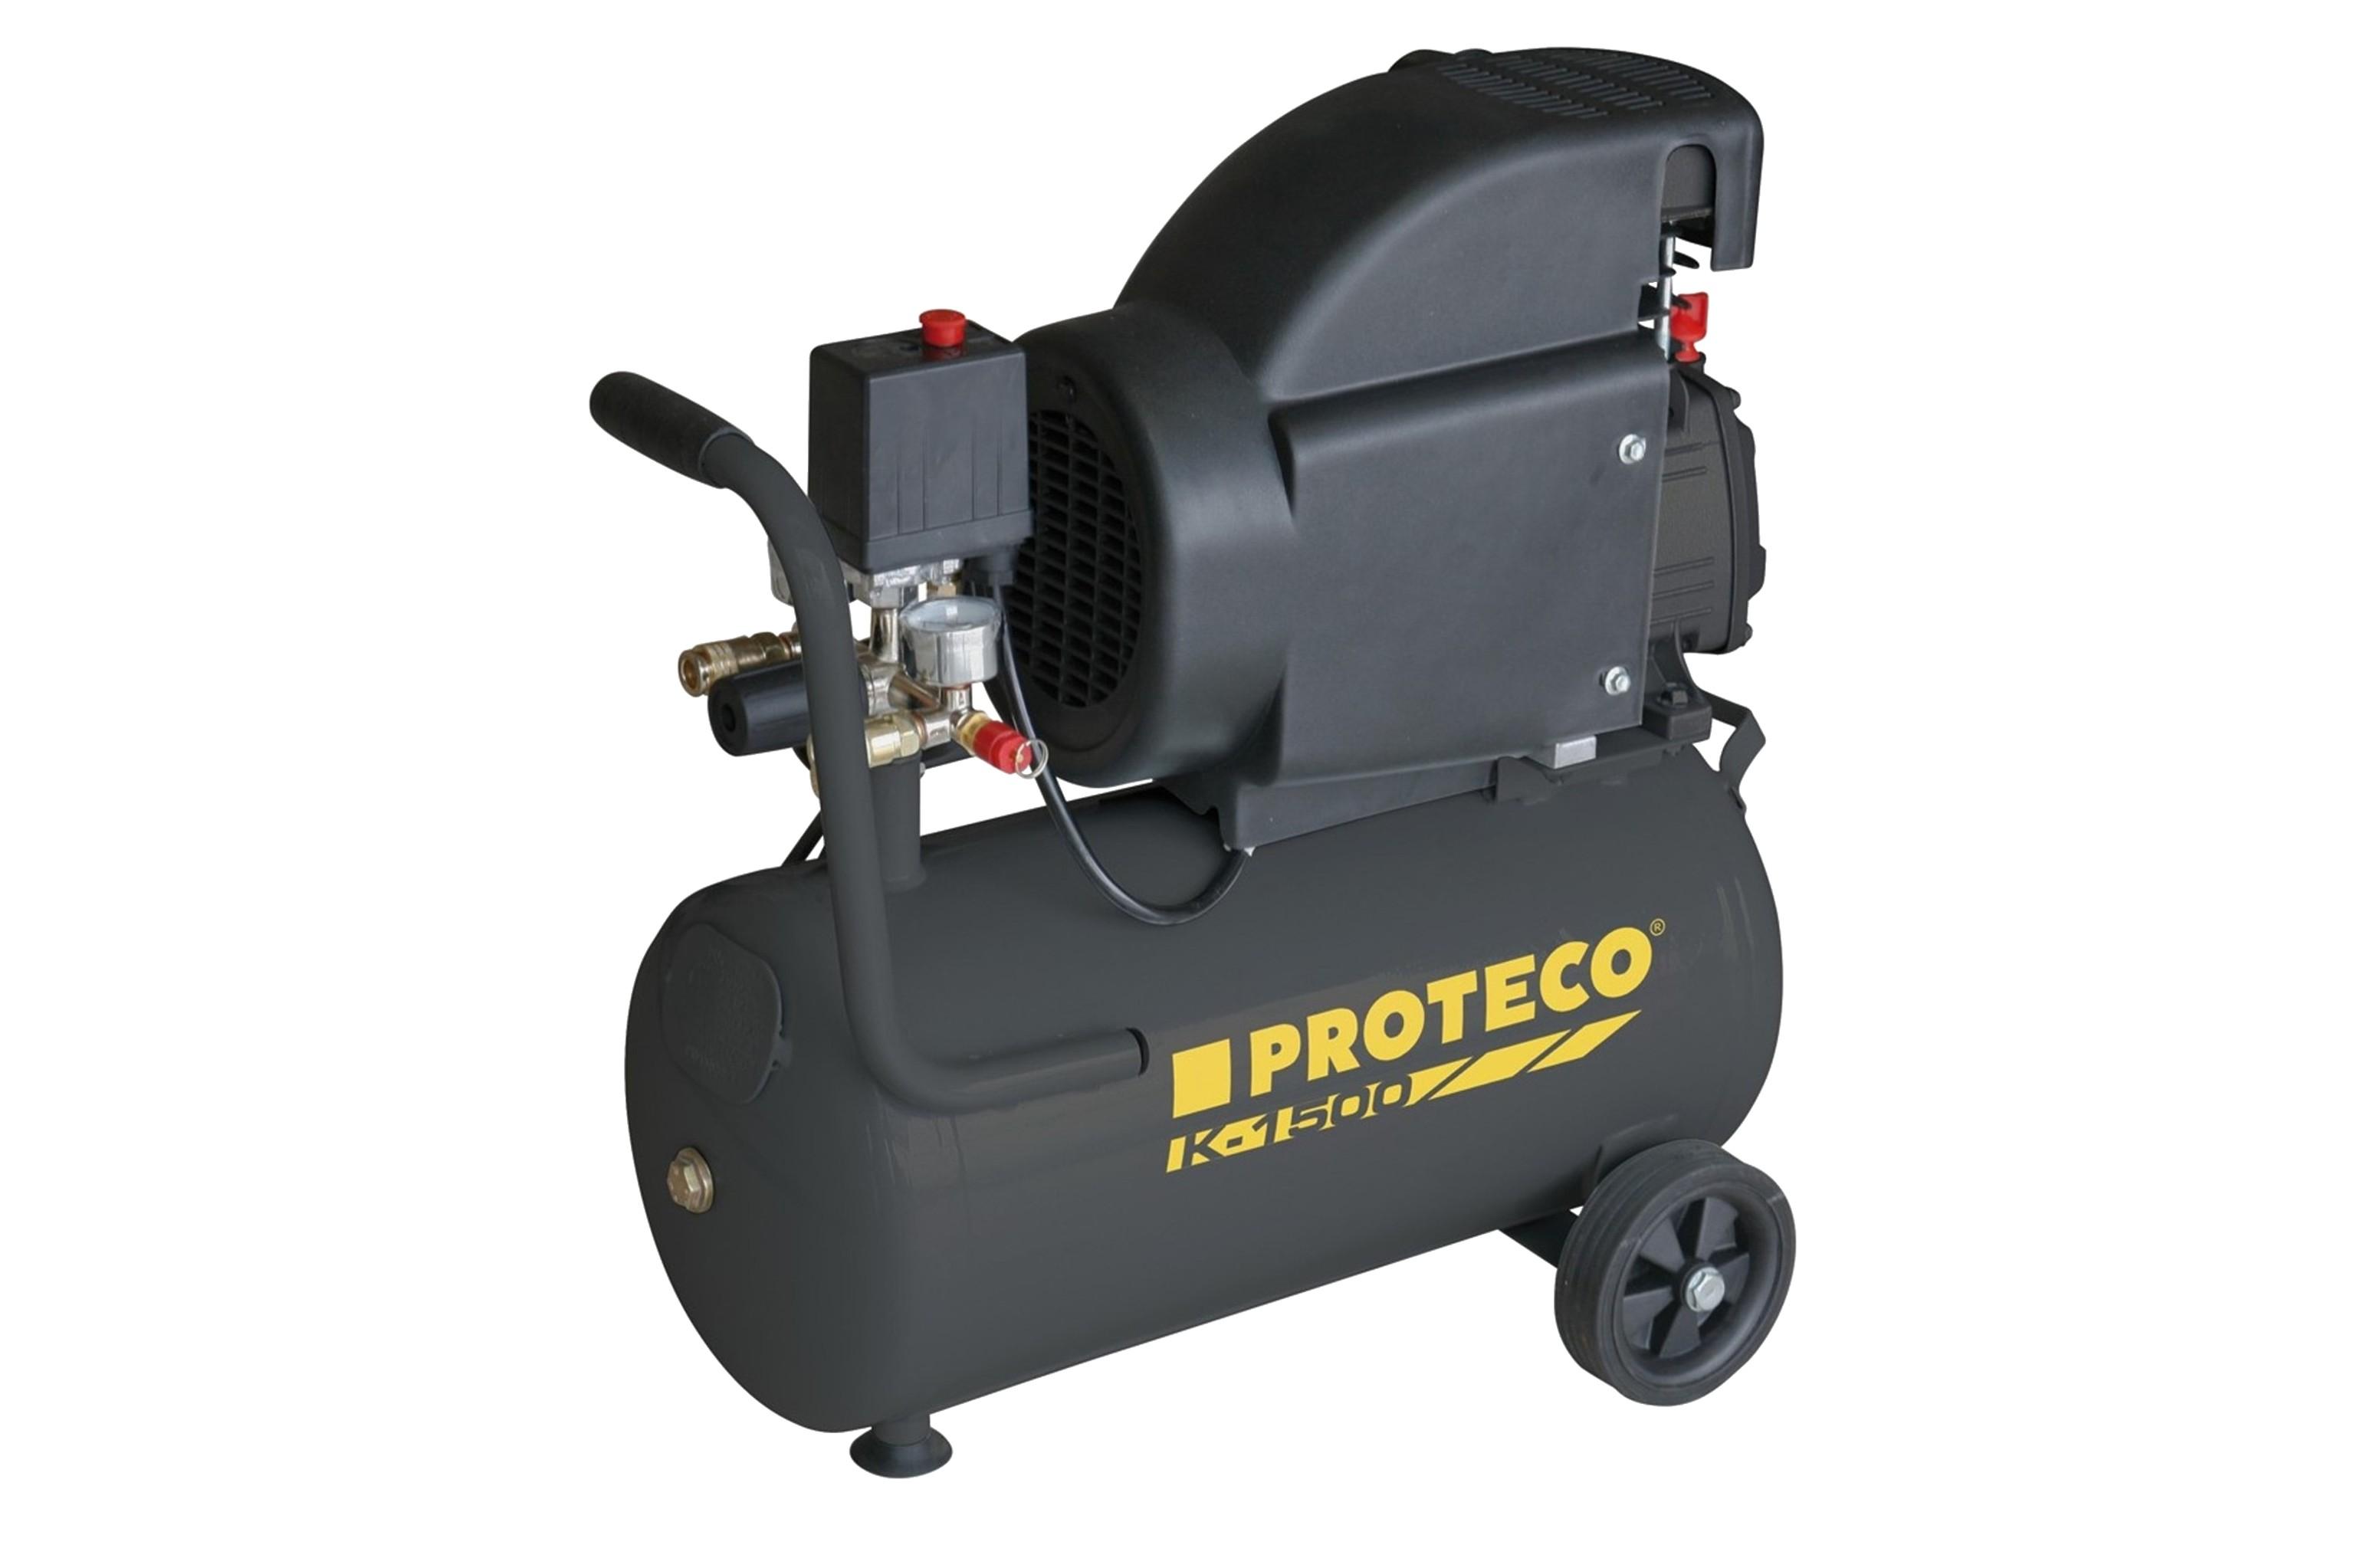 PROTECO 51.02-K-1500 kompresor 1.5kW, nádoba 24L